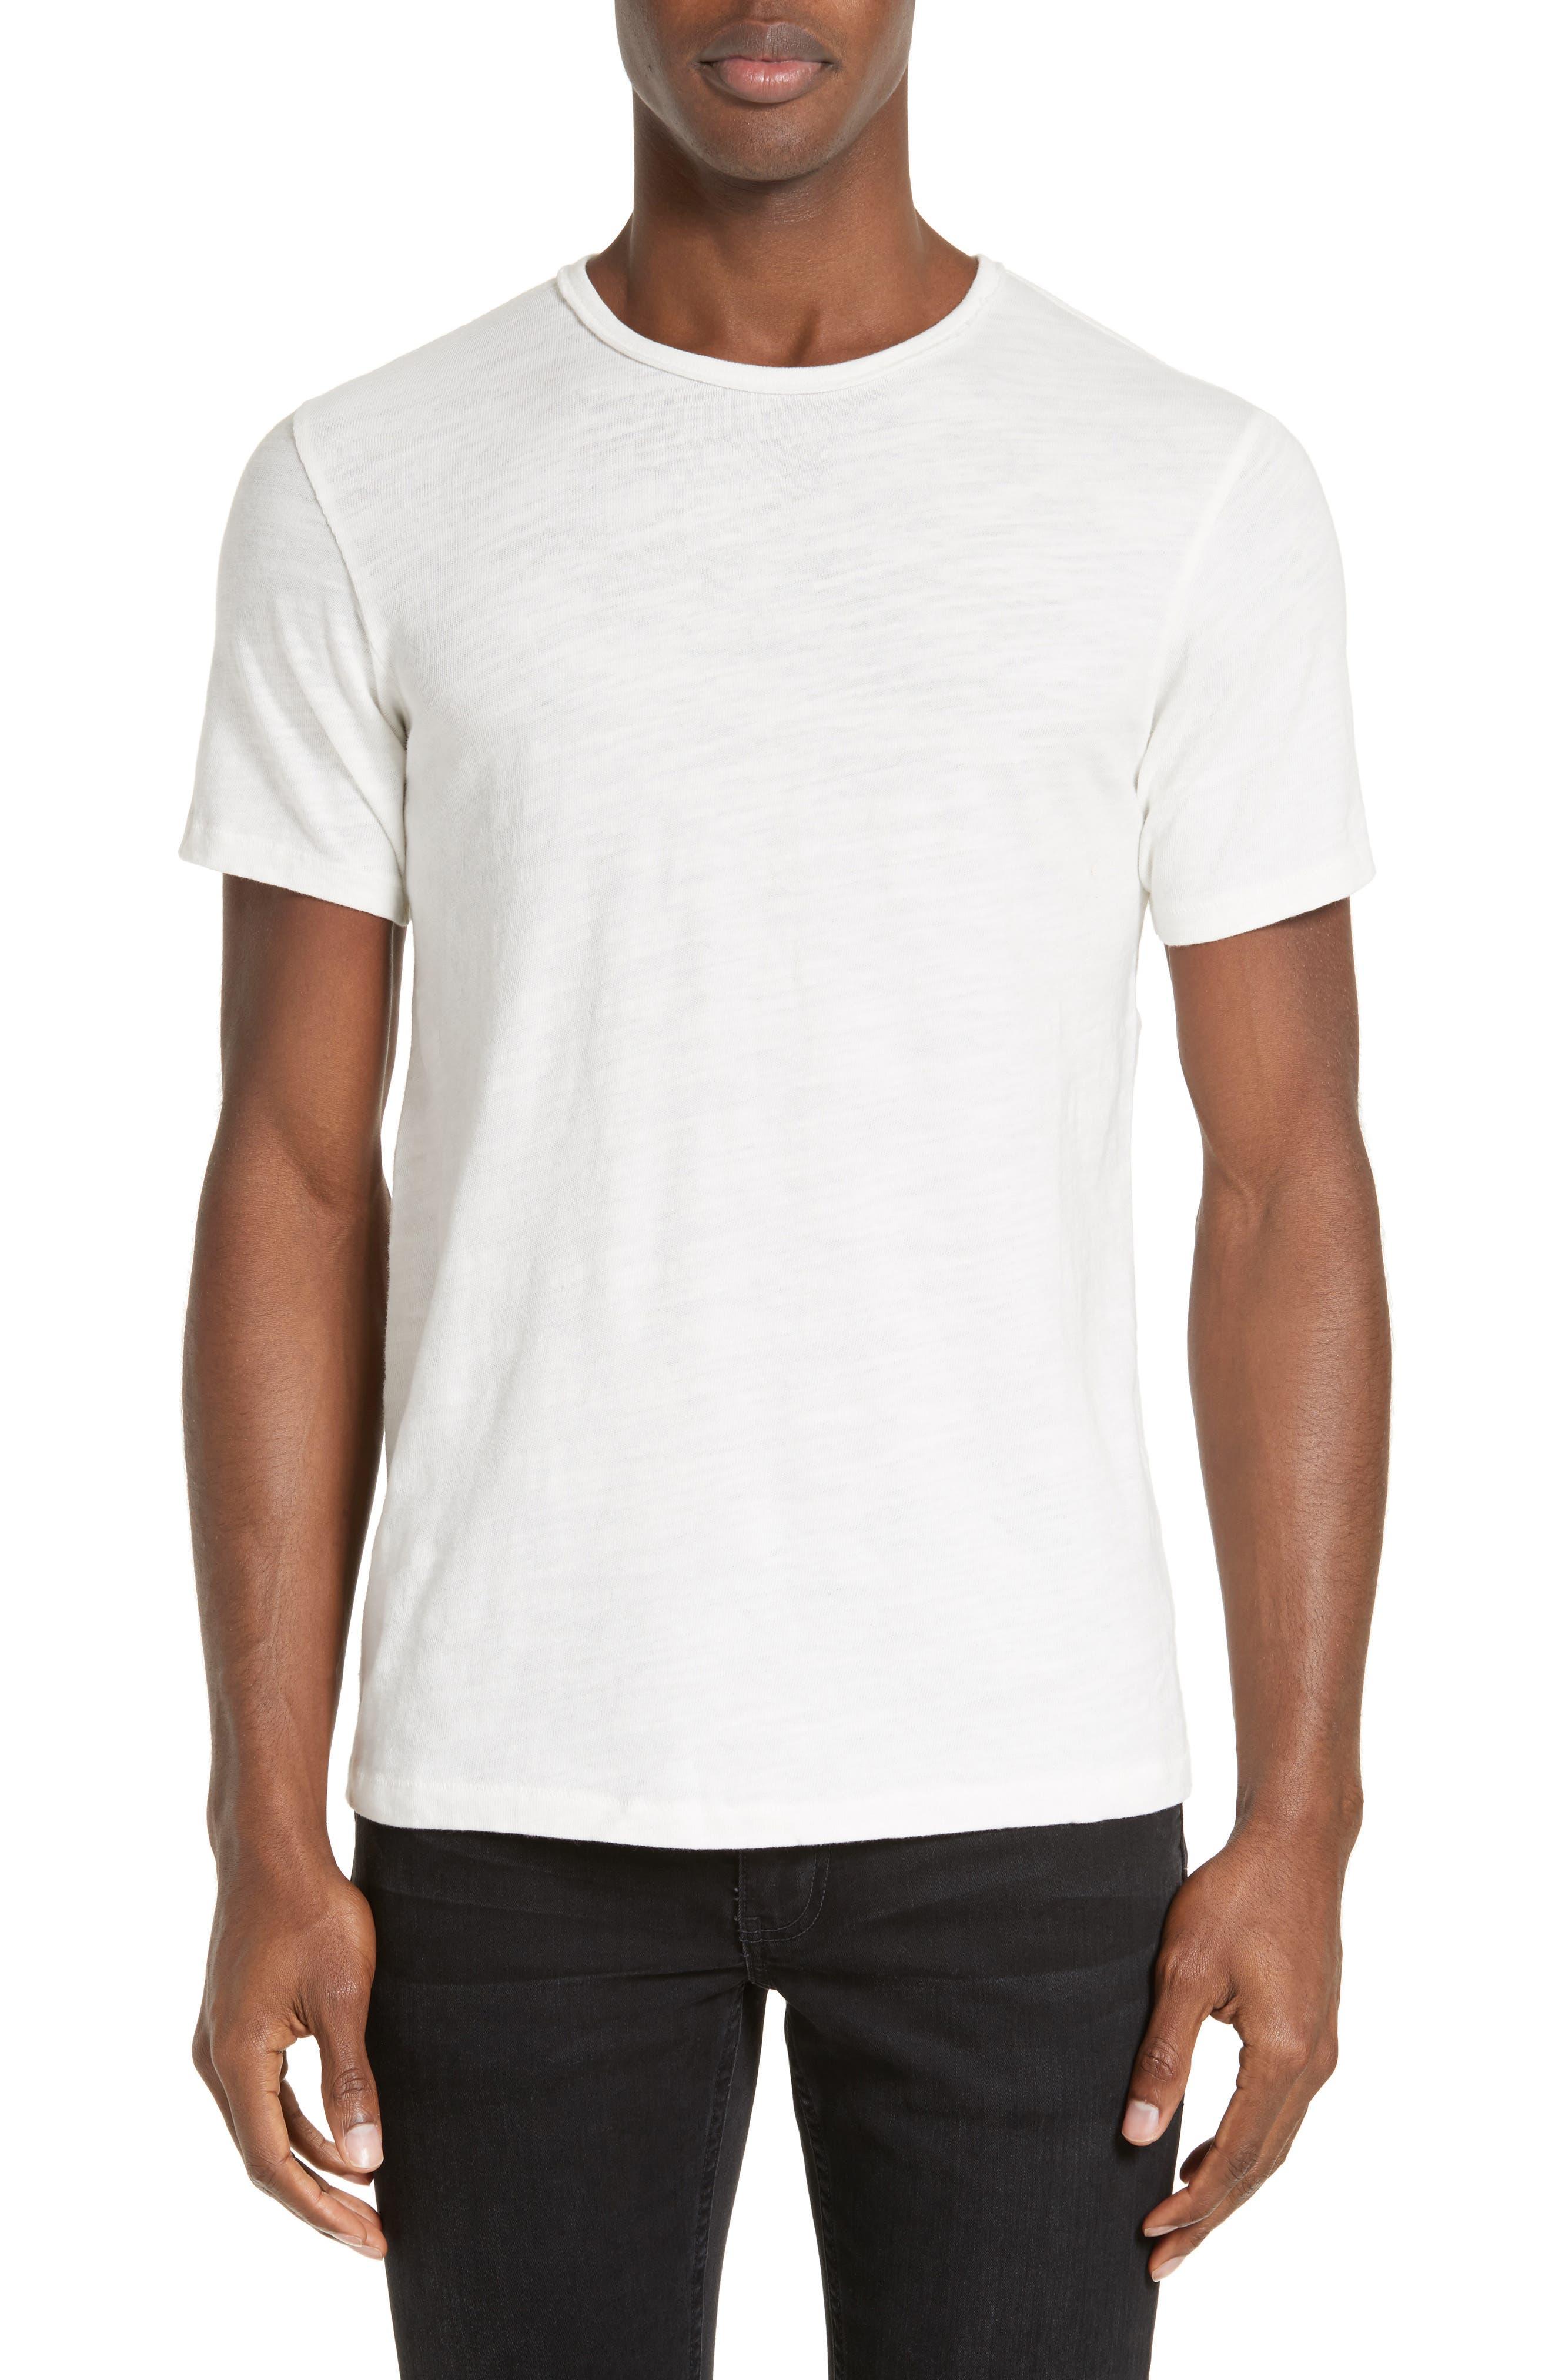 Rag bone standard issue basic crewneck short sleeve t for Rag and bone white t shirt